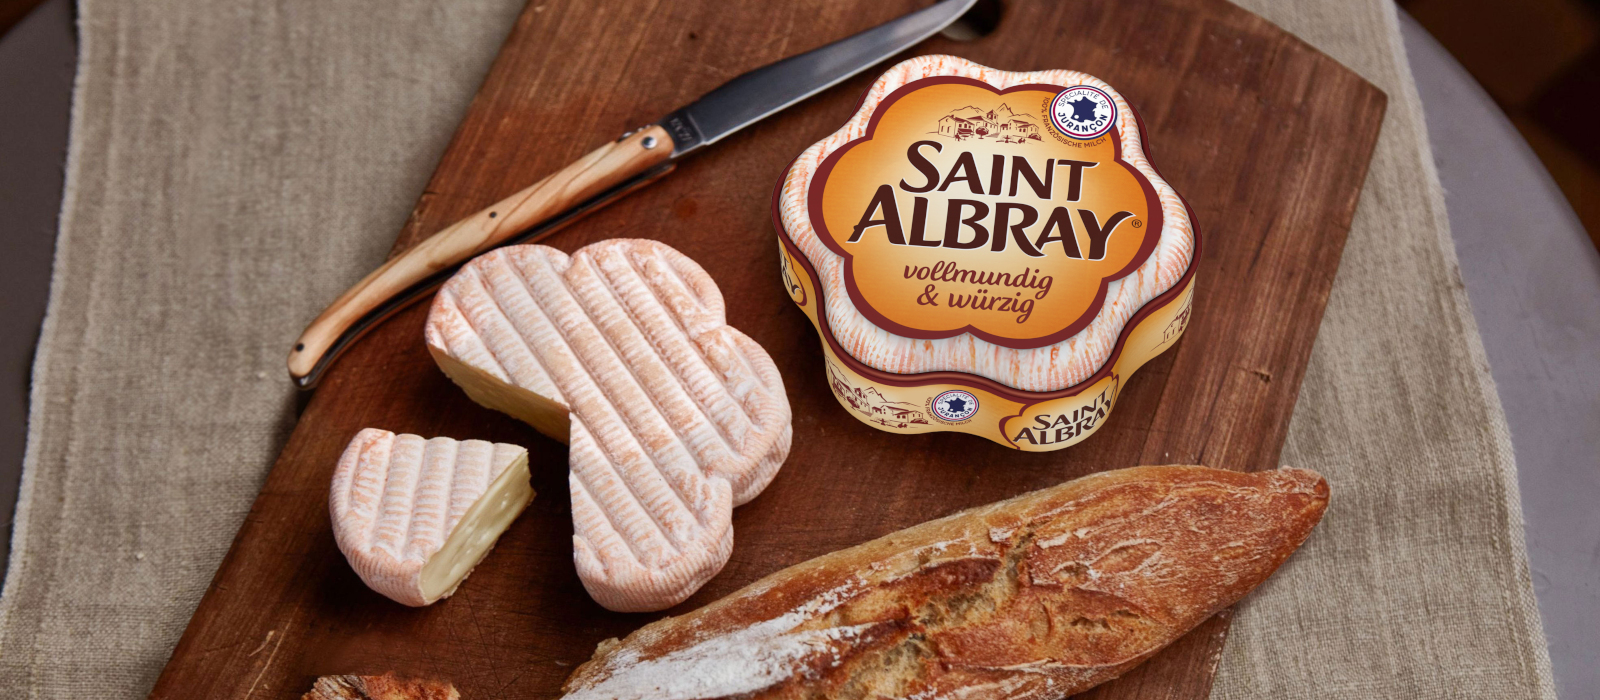 Saint Albray - Entdecke die Würze Frankreichs!